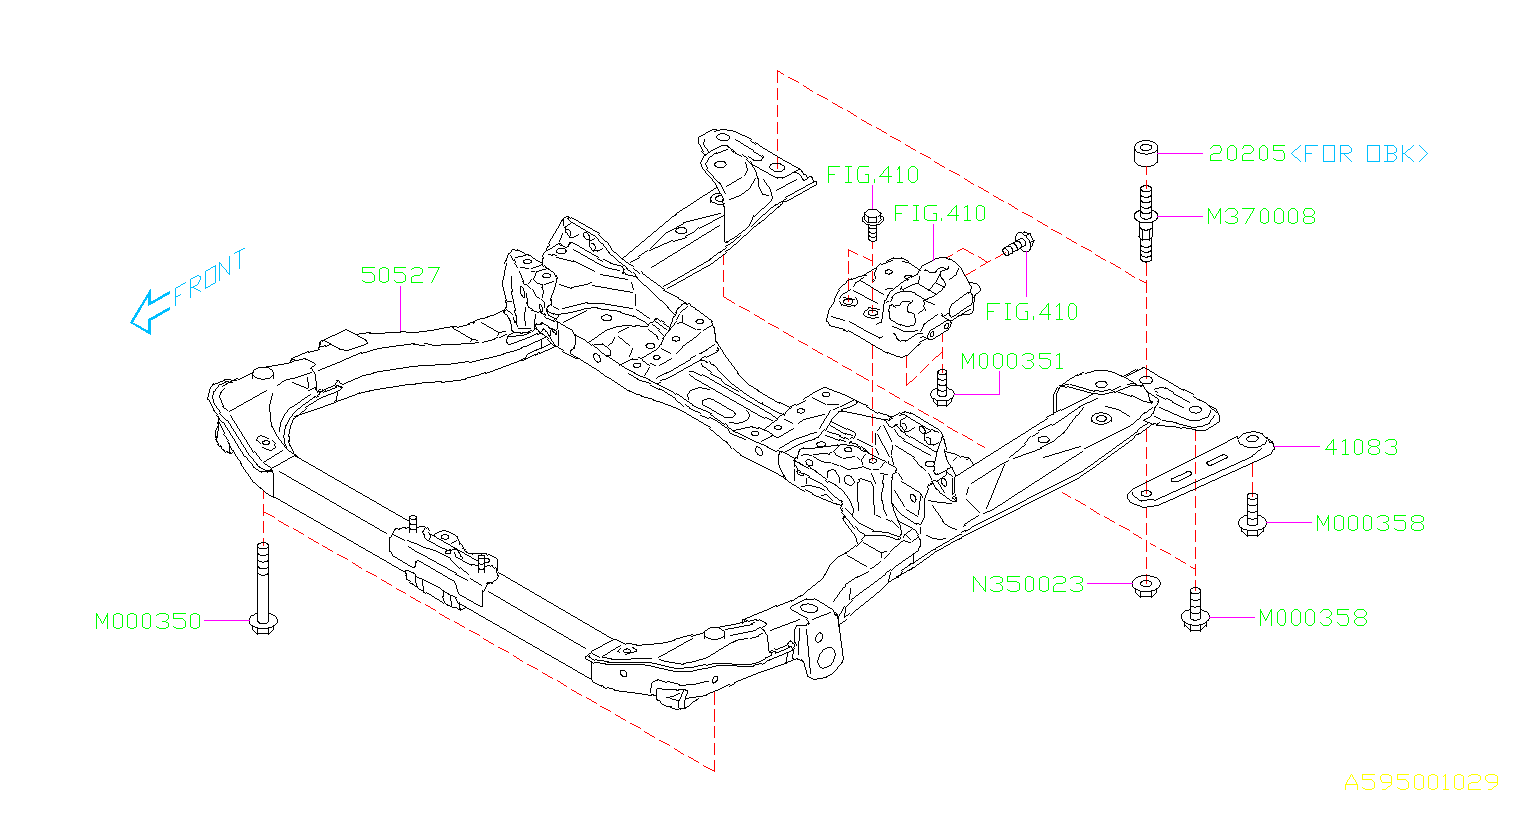 50527aj01a - engine cradle  frame complete cradle  cradle frm cp obk